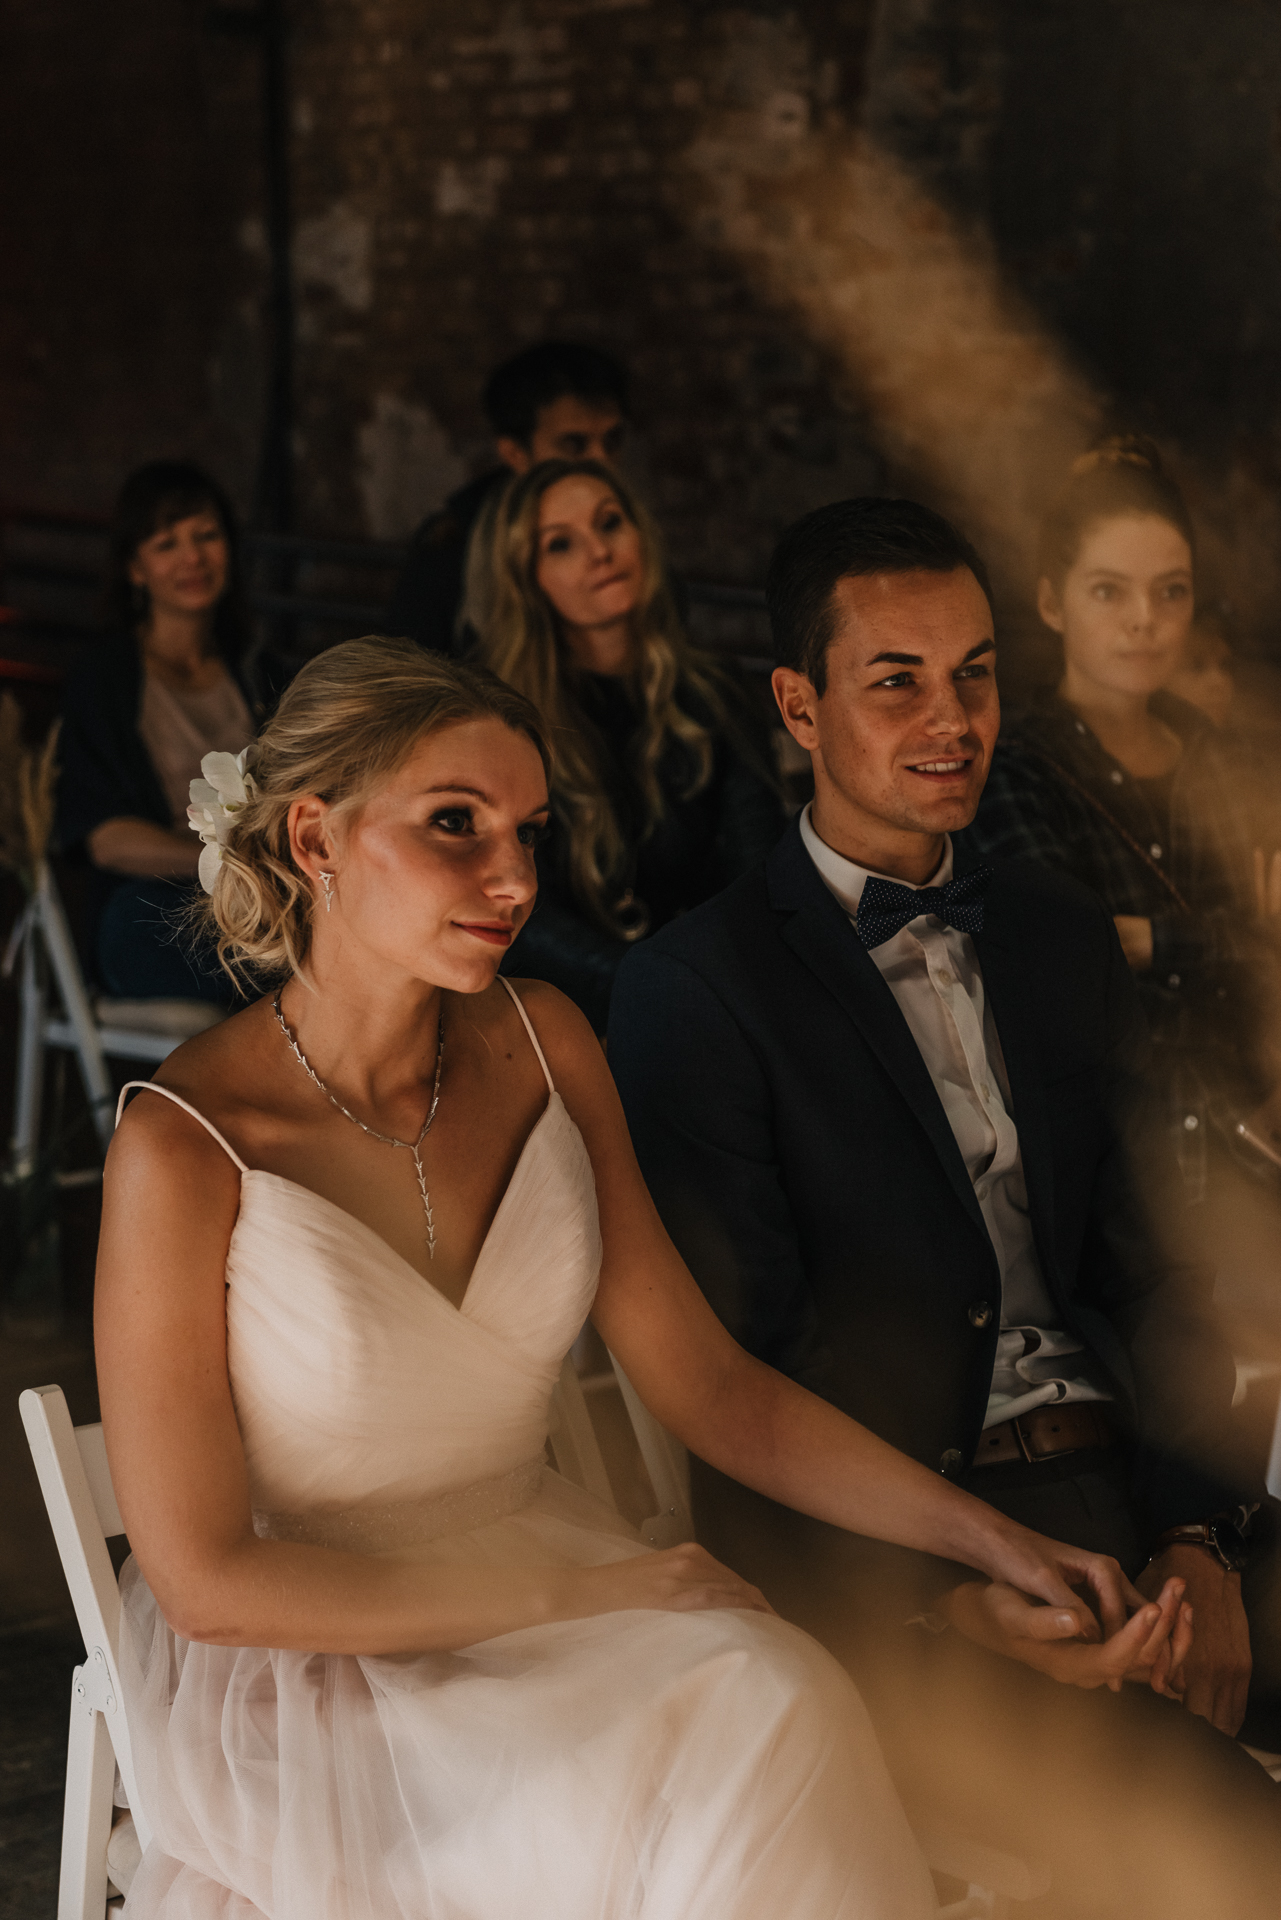 Zweinander-LeonoreHerzog-WeddingMarket-OnTour20191110-8882